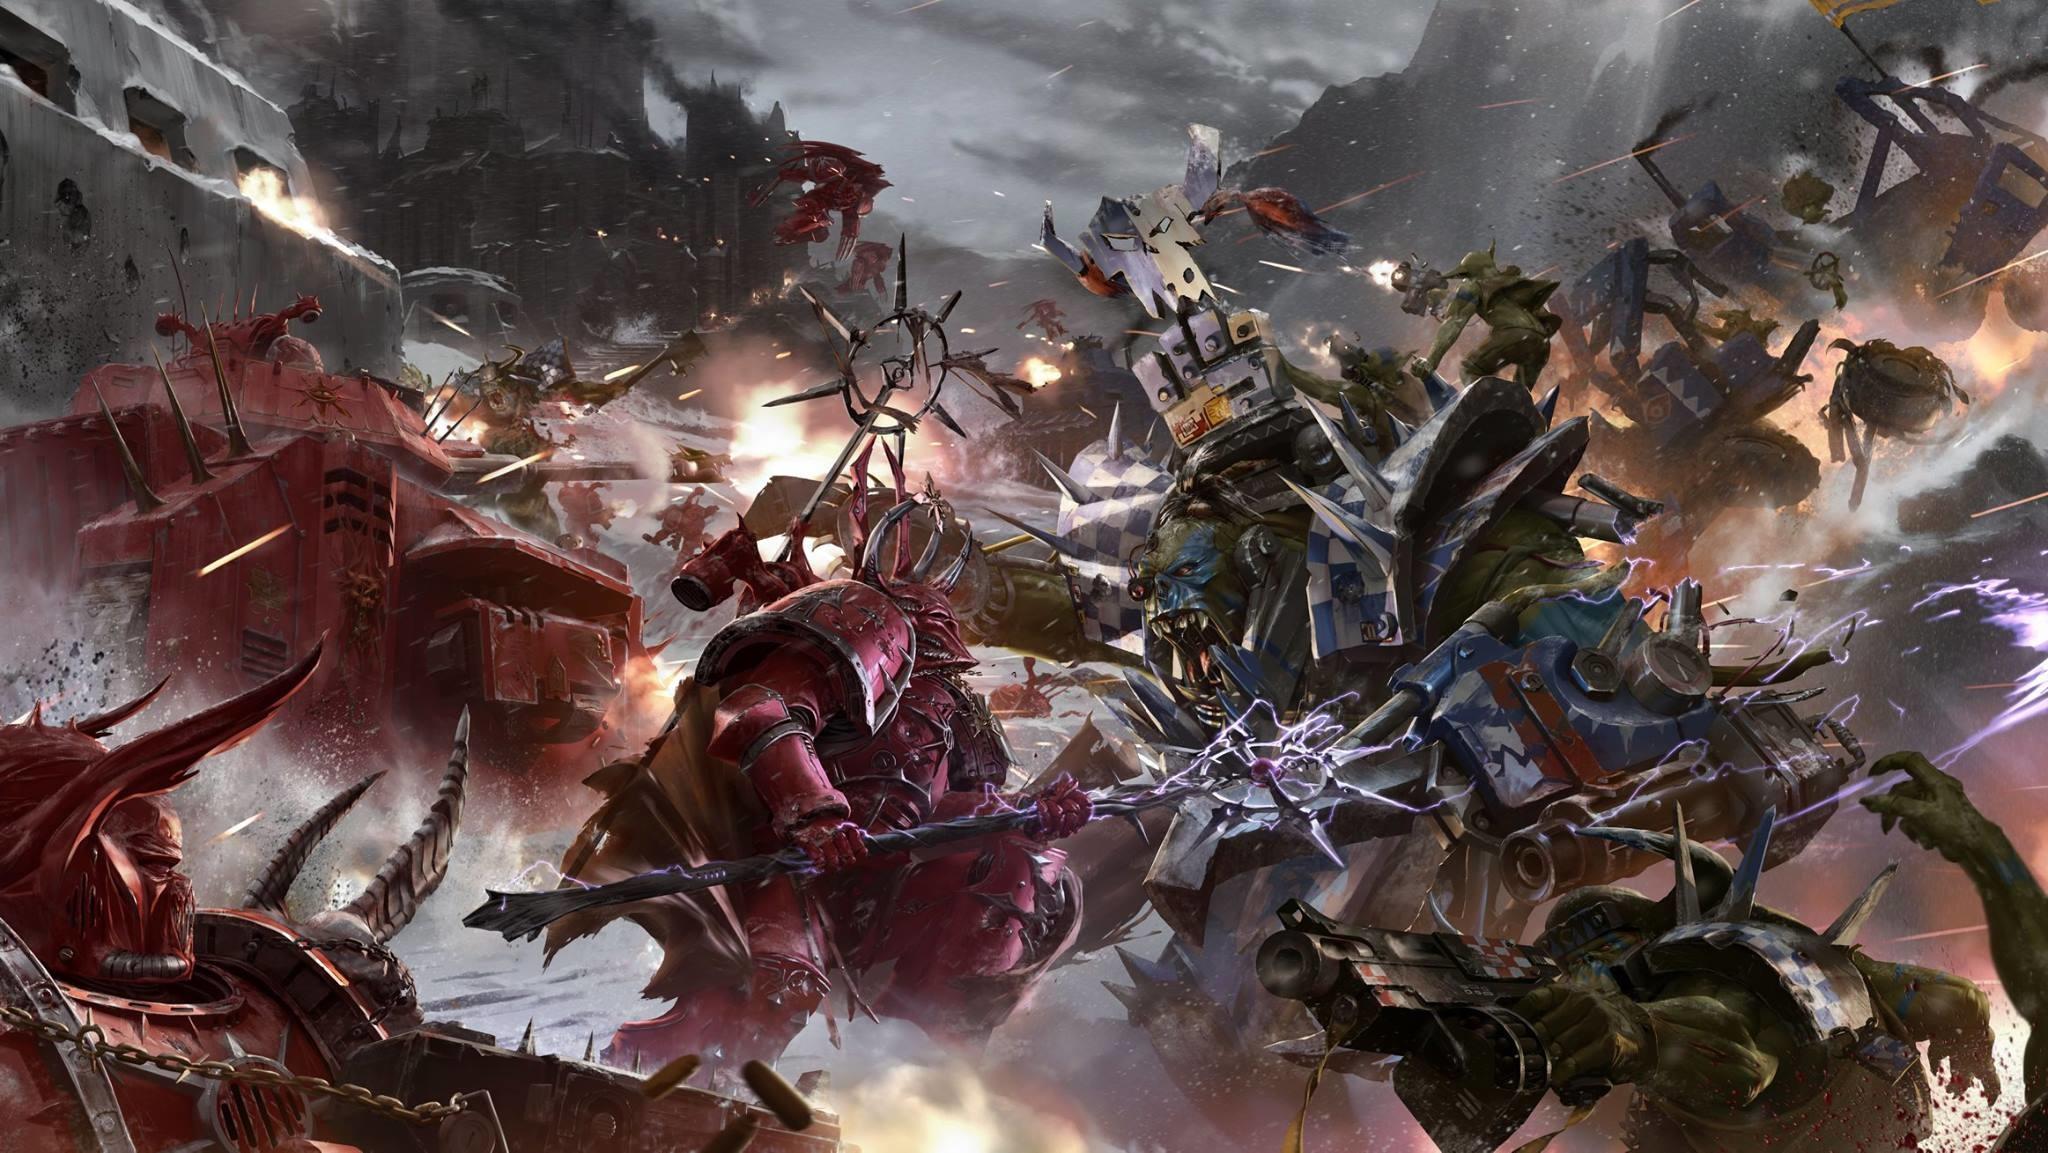 Warhammer 40,000 Eternal Crusade wallpaper 1